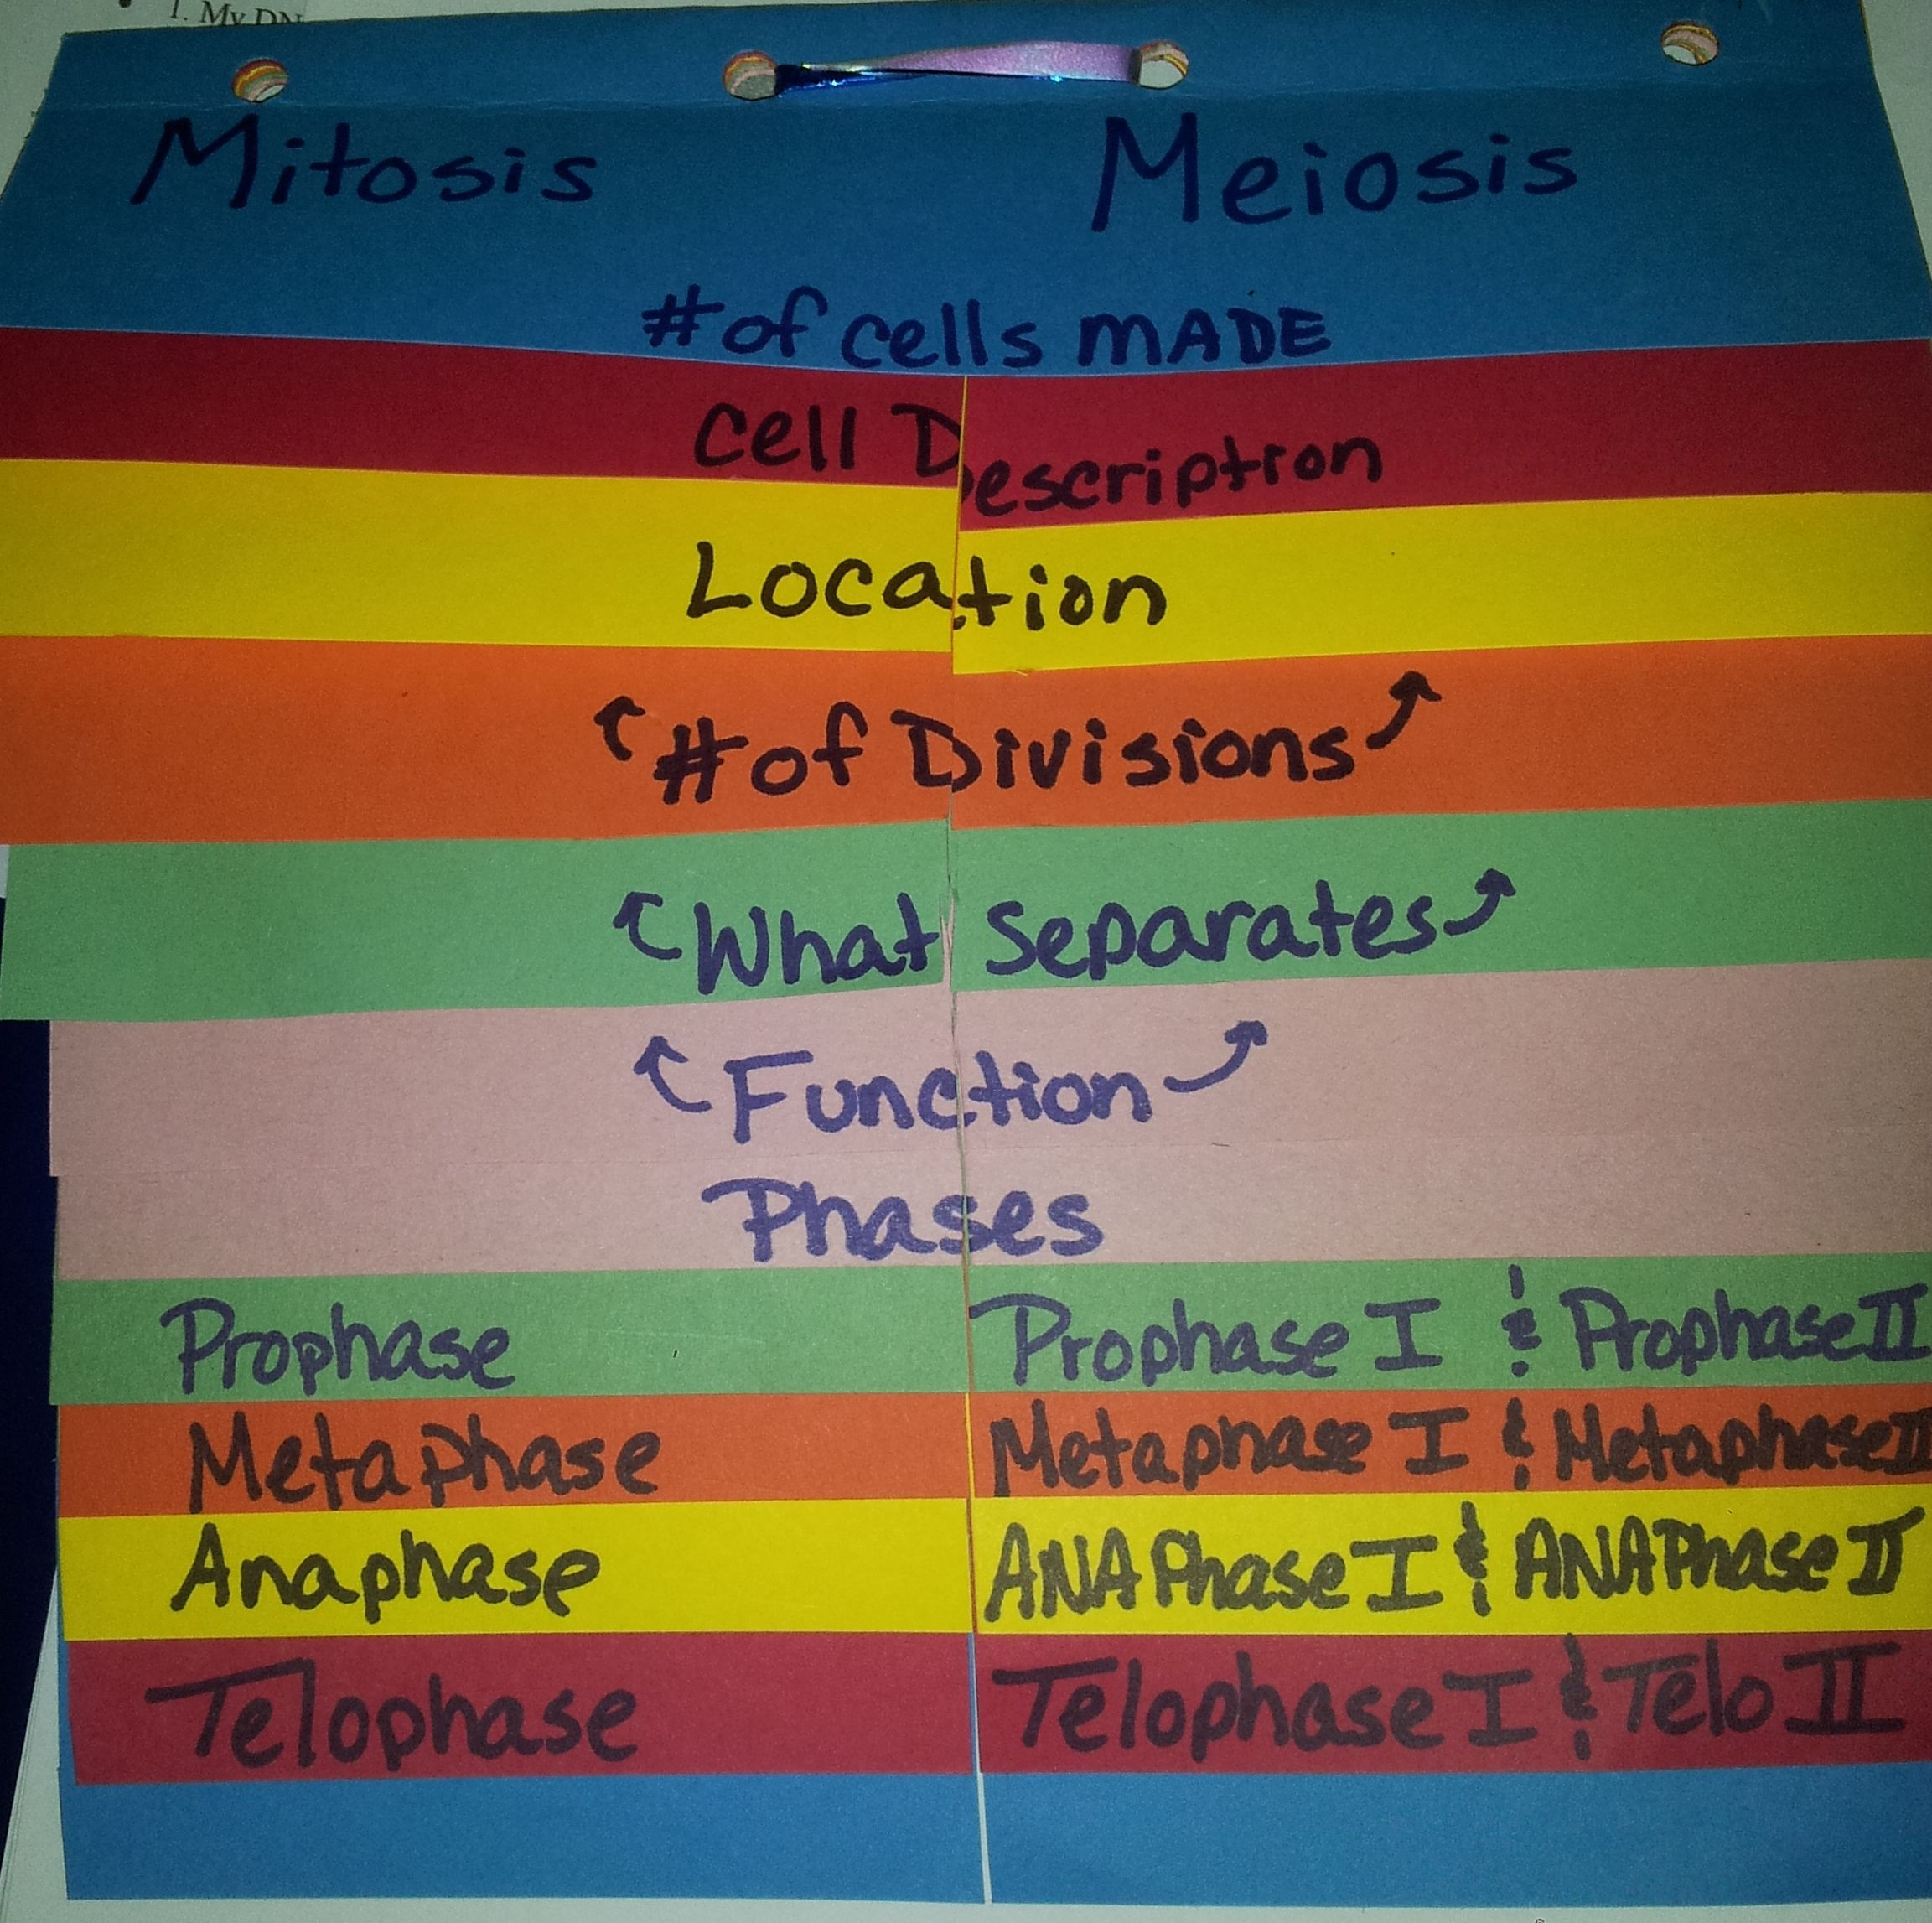 Mitotis And Meiosis Foldable No Description But I Think I